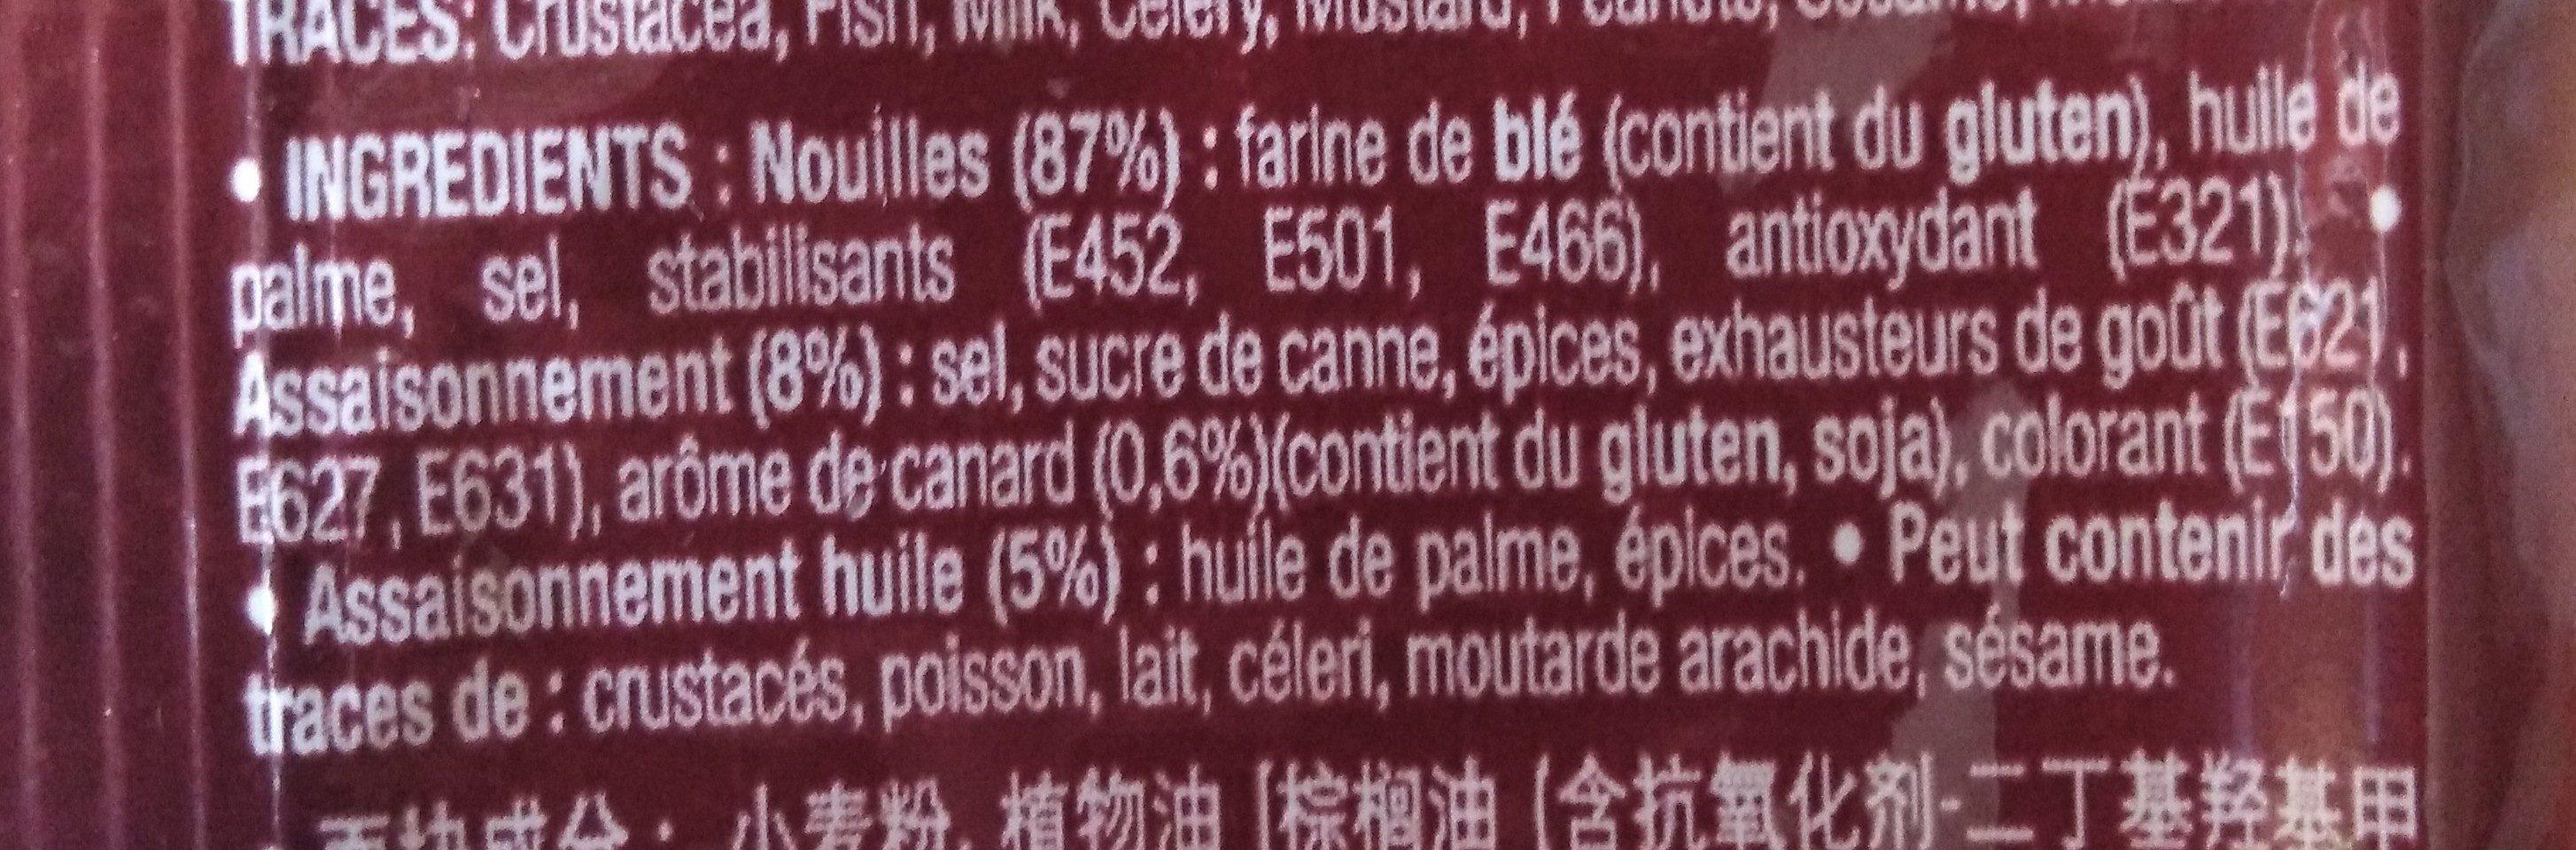 Nouilles instantanées saveur canard - Ingredients - fr